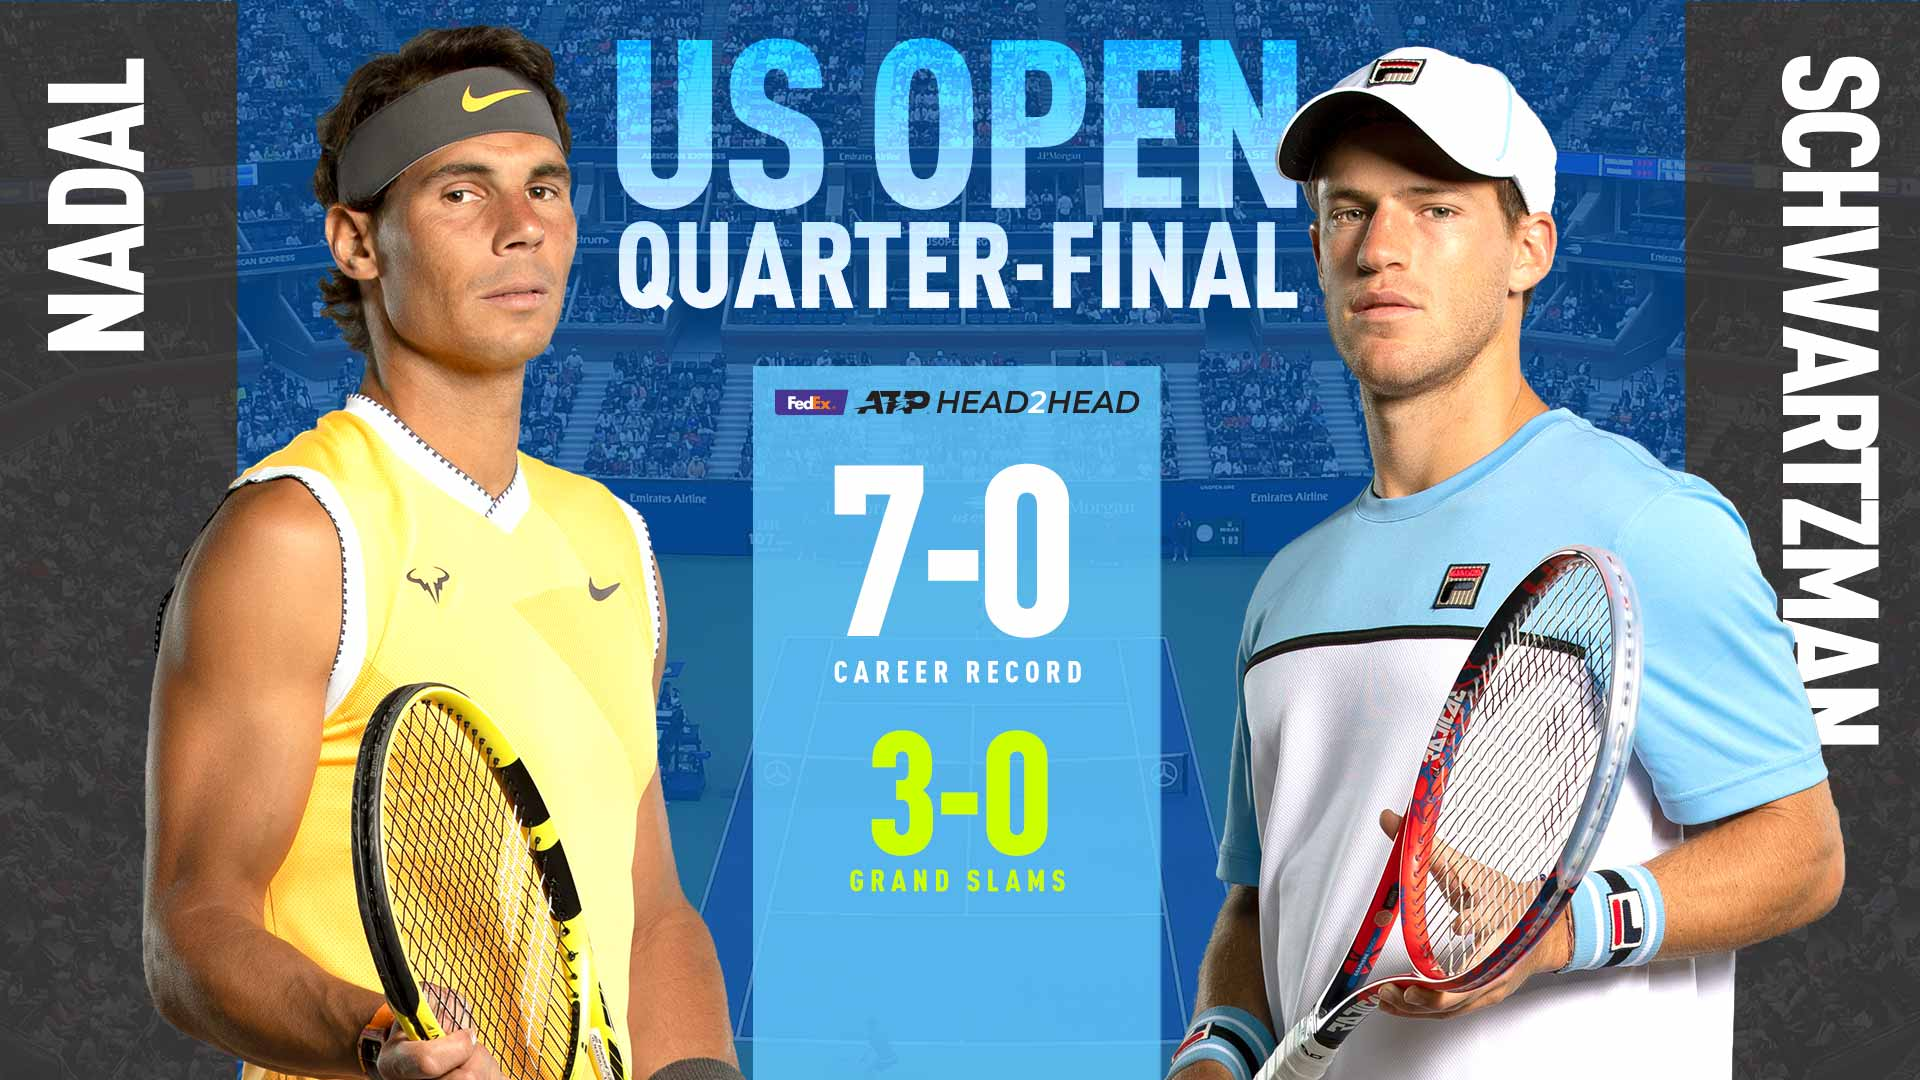 Qf Preview Rafael Nadal Diego Schwartzman Clash In Ashe Us Open 2019 Atp Tour Tennis